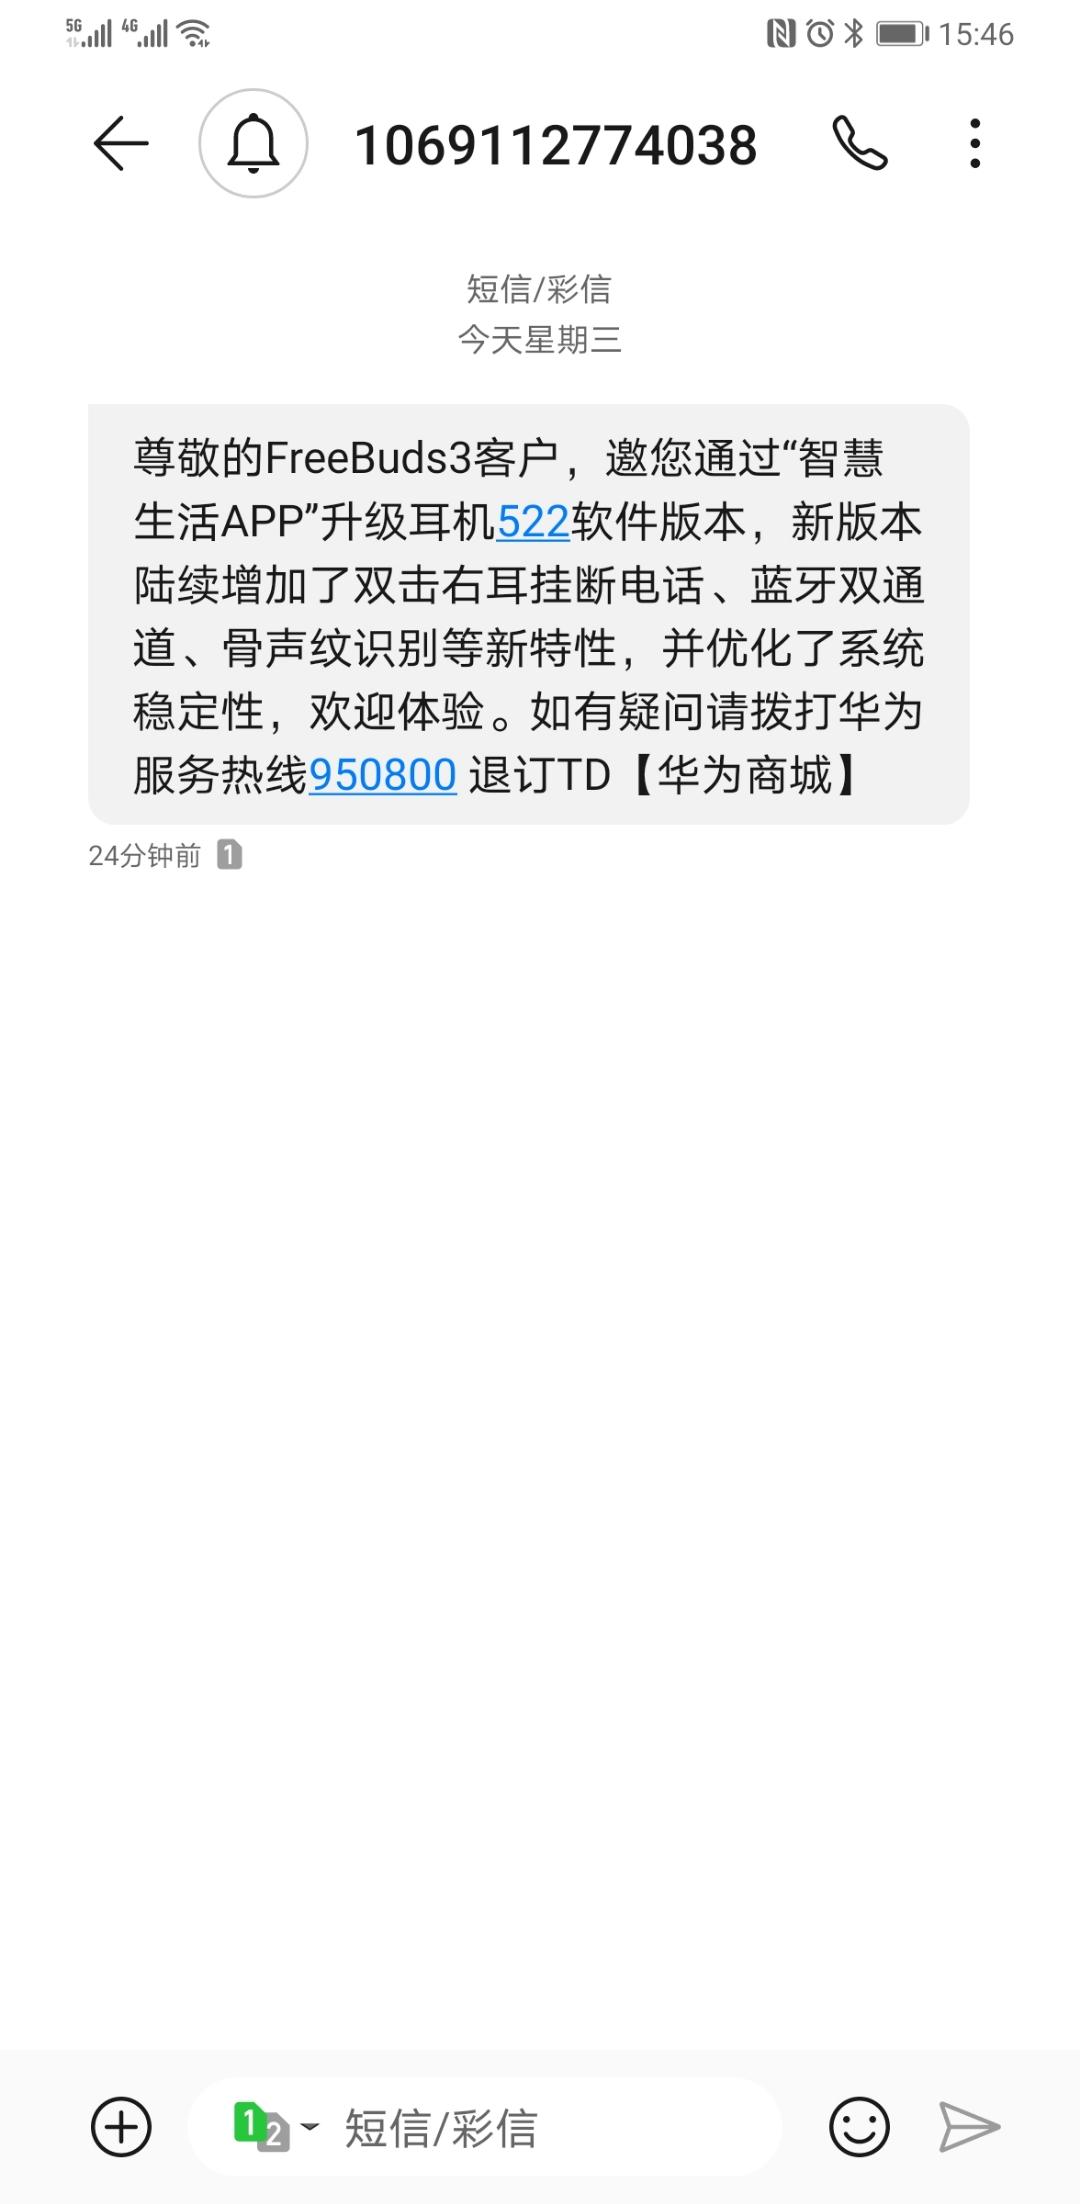 Screenshot_20200513_154621_com.android.mms.jpg